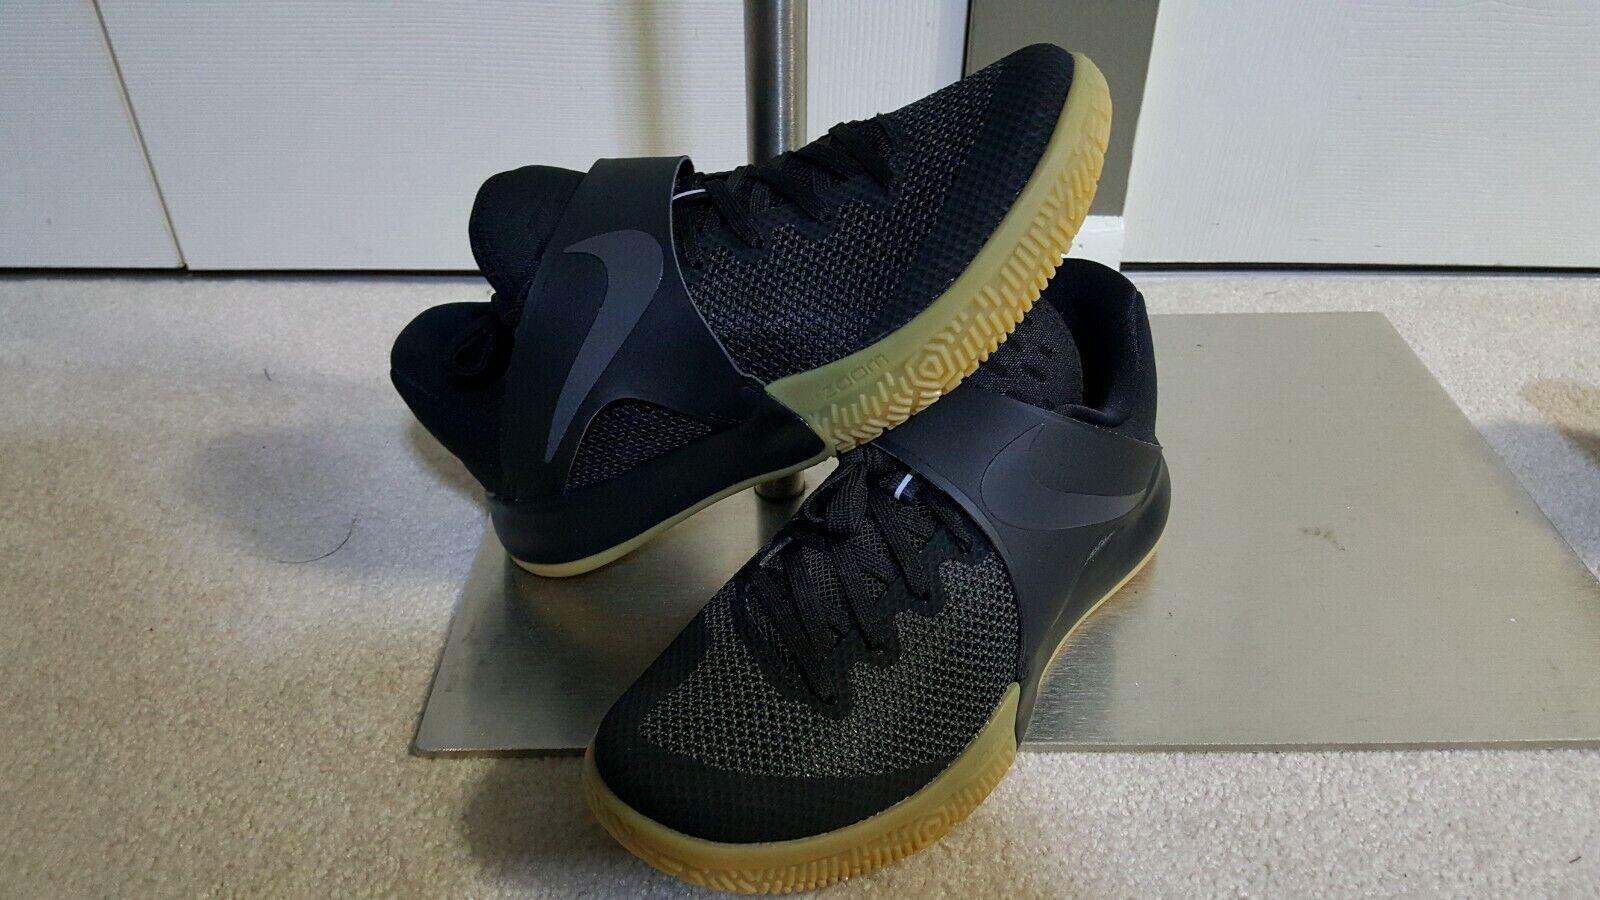 Nuovo Nike Zoom Live Uomo Basket Sautope da Ginnastica Misura 9 Sautope classeiche da uomo